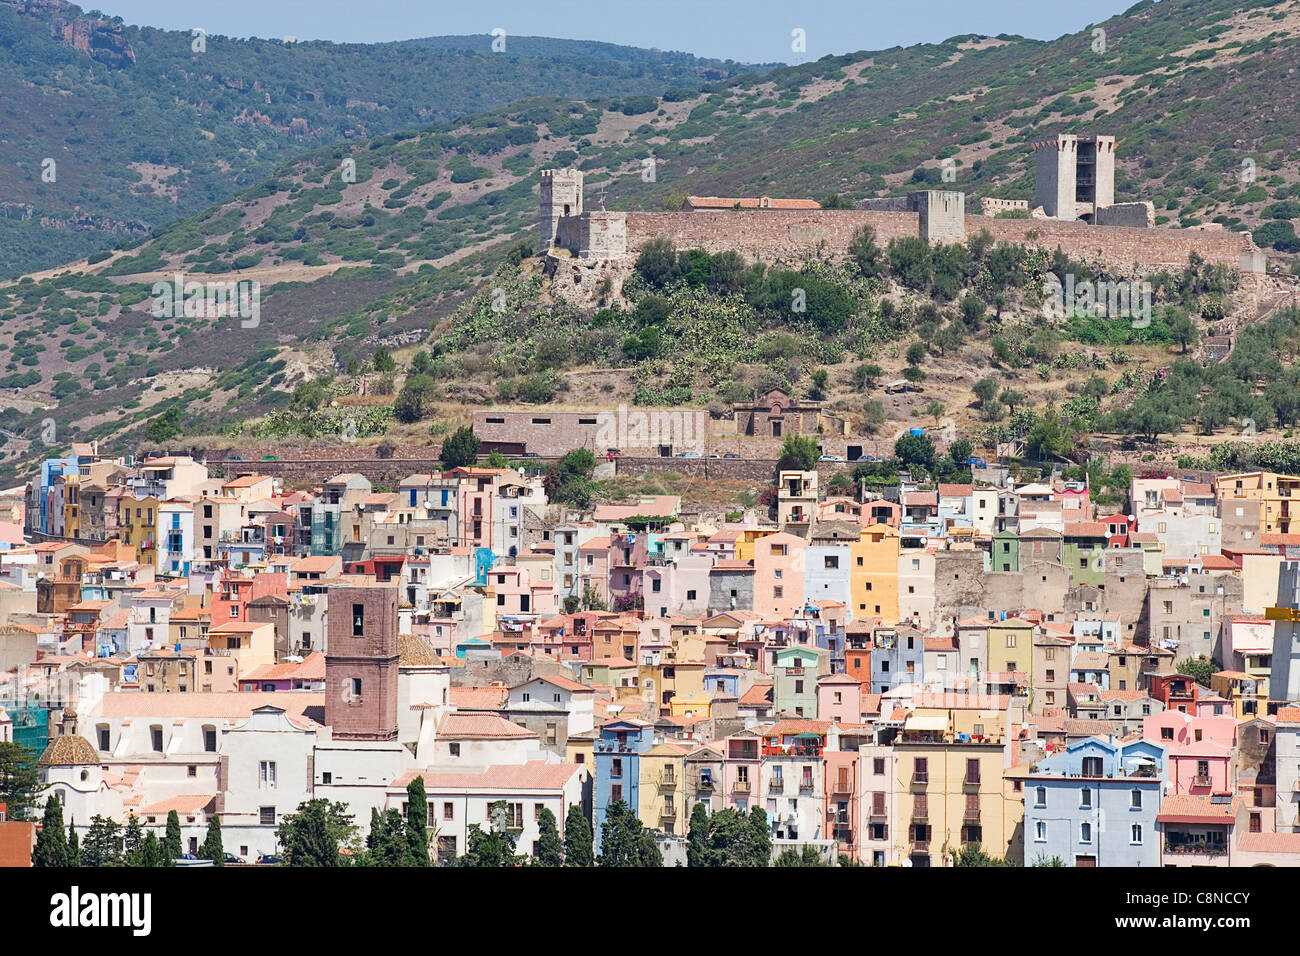 Italy, Sardinia, Bosa, Sa Costa medieval quarter with castle Castello di Malaspina on top of the hill - Stock Image